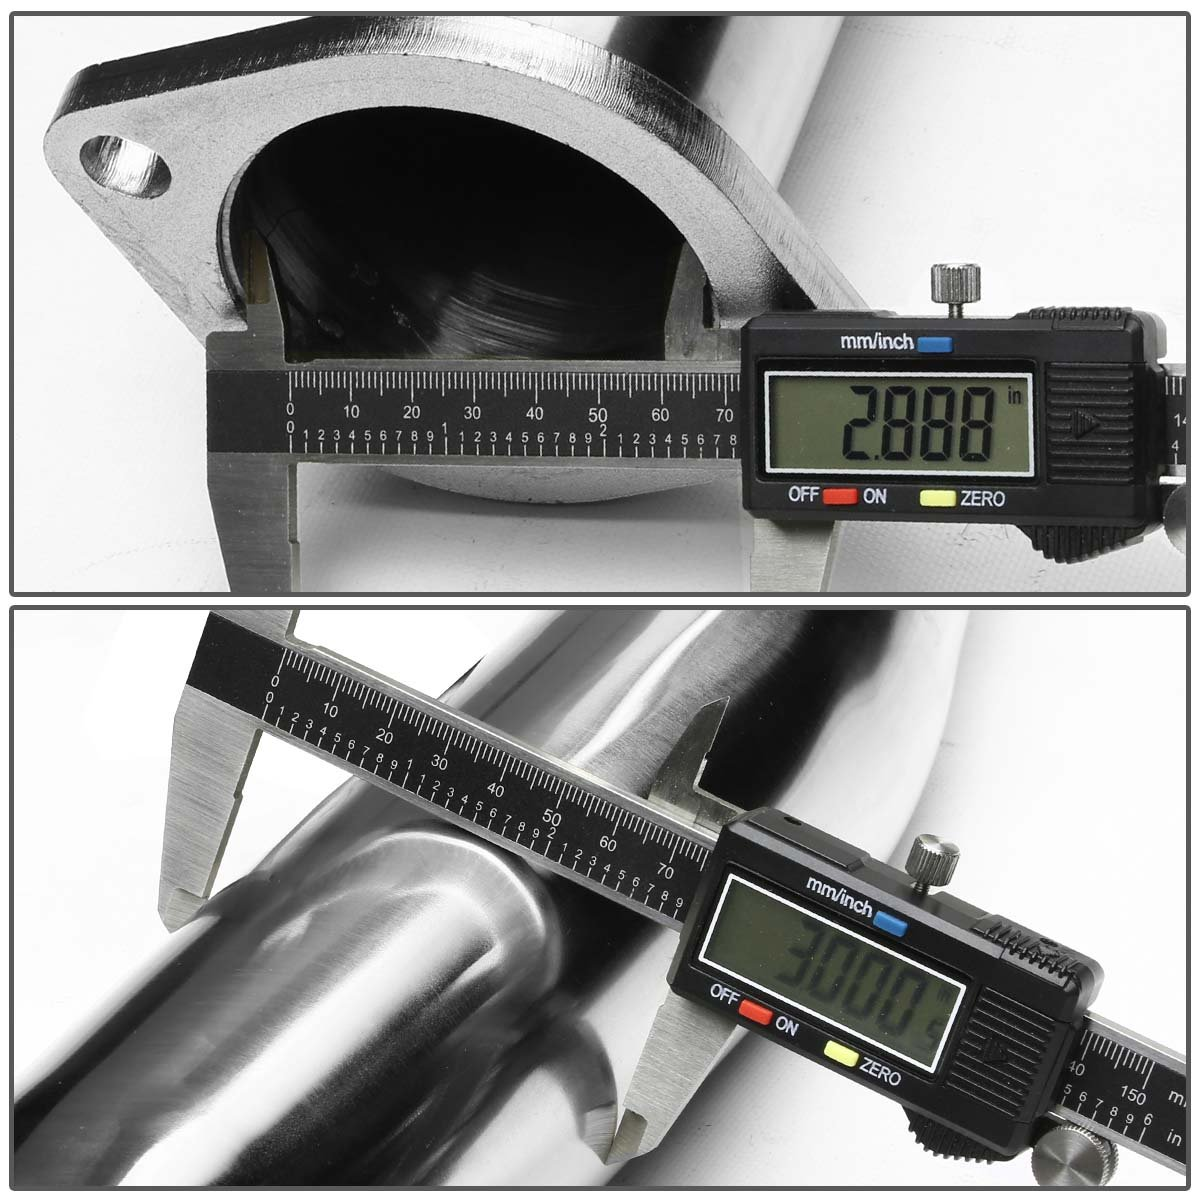 Amazon.com: DNA Motoring DP-WRX02 Turbo Exhaust Downpipe Kit [For 02-07 Subaru Impreza WRX]: Automotive